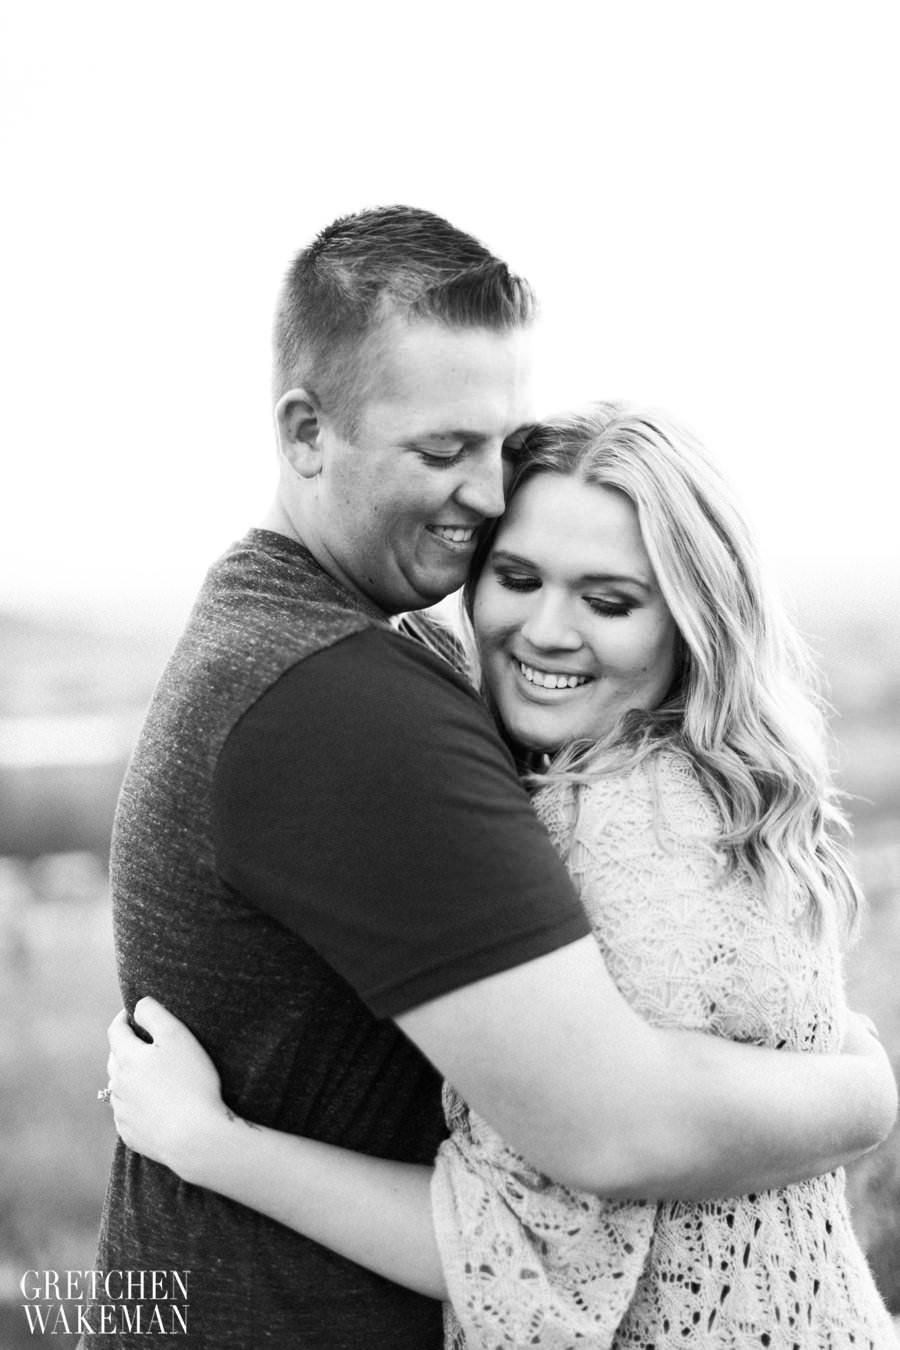 Simmons Engagement-100_GRETCHEN WAKEMAN PHOTOGRAPHY.jpg